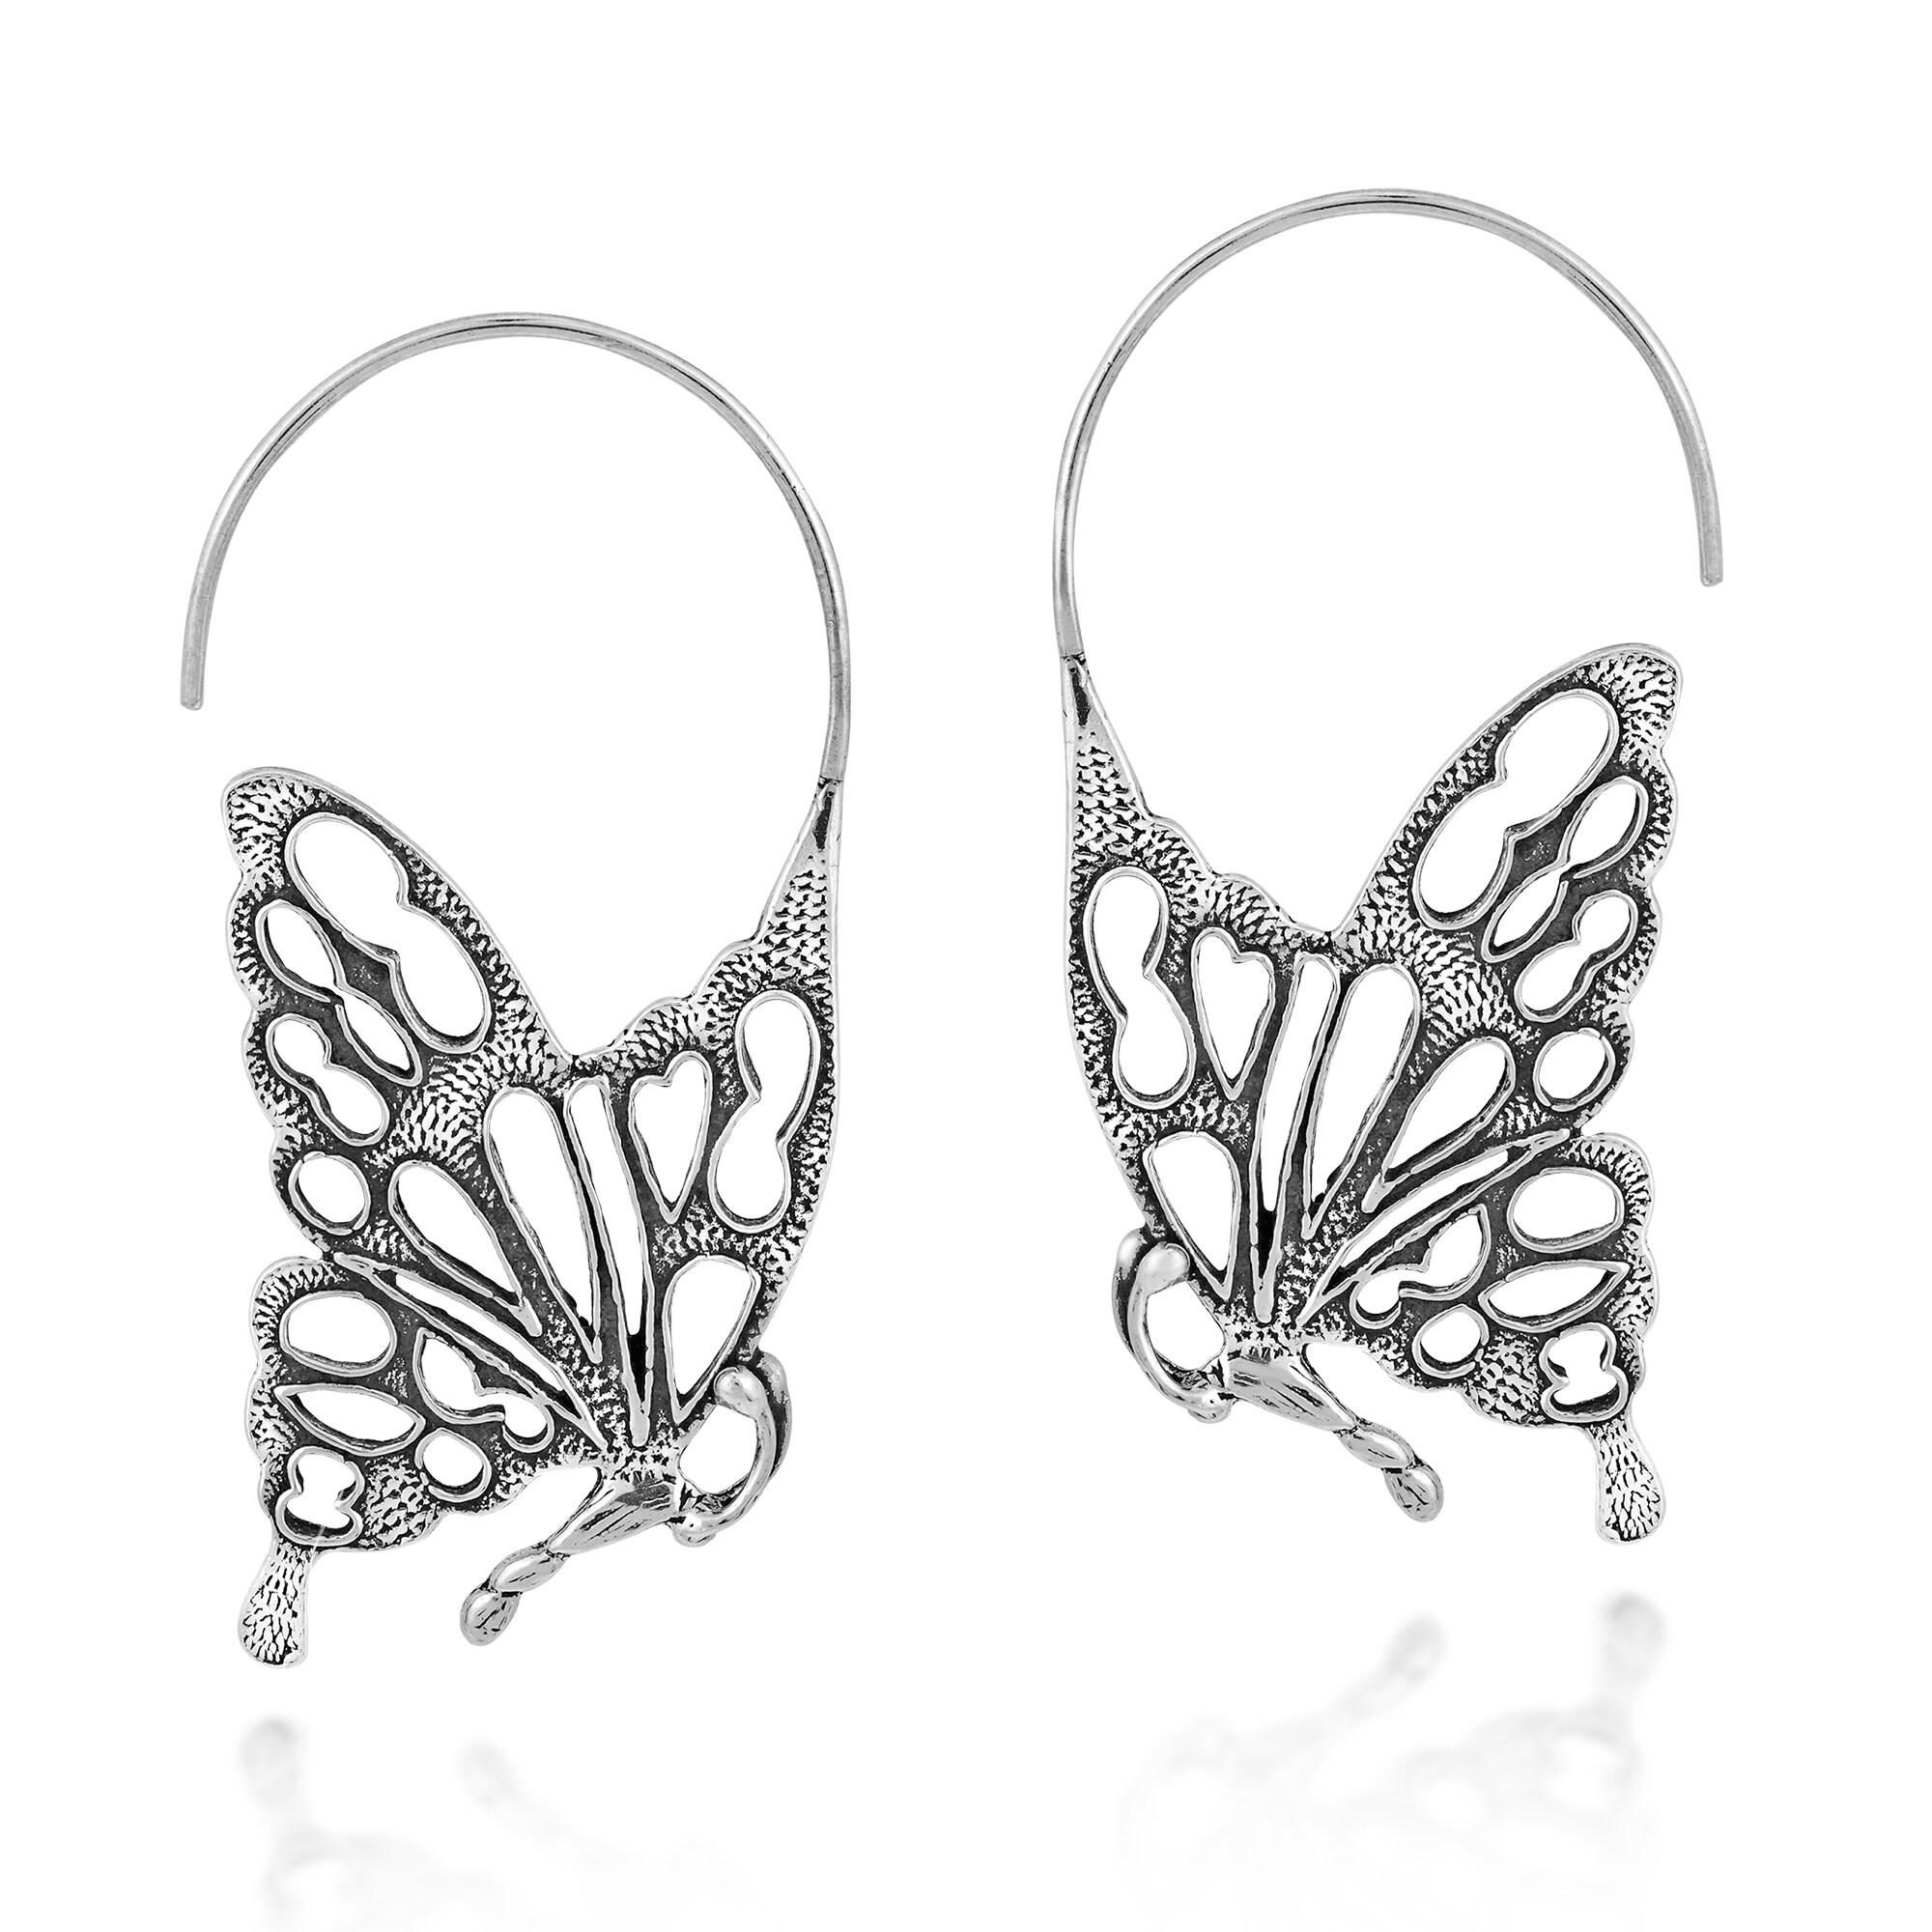 Medium Size Hand Forged Sterling Hoop Dangle Earrings